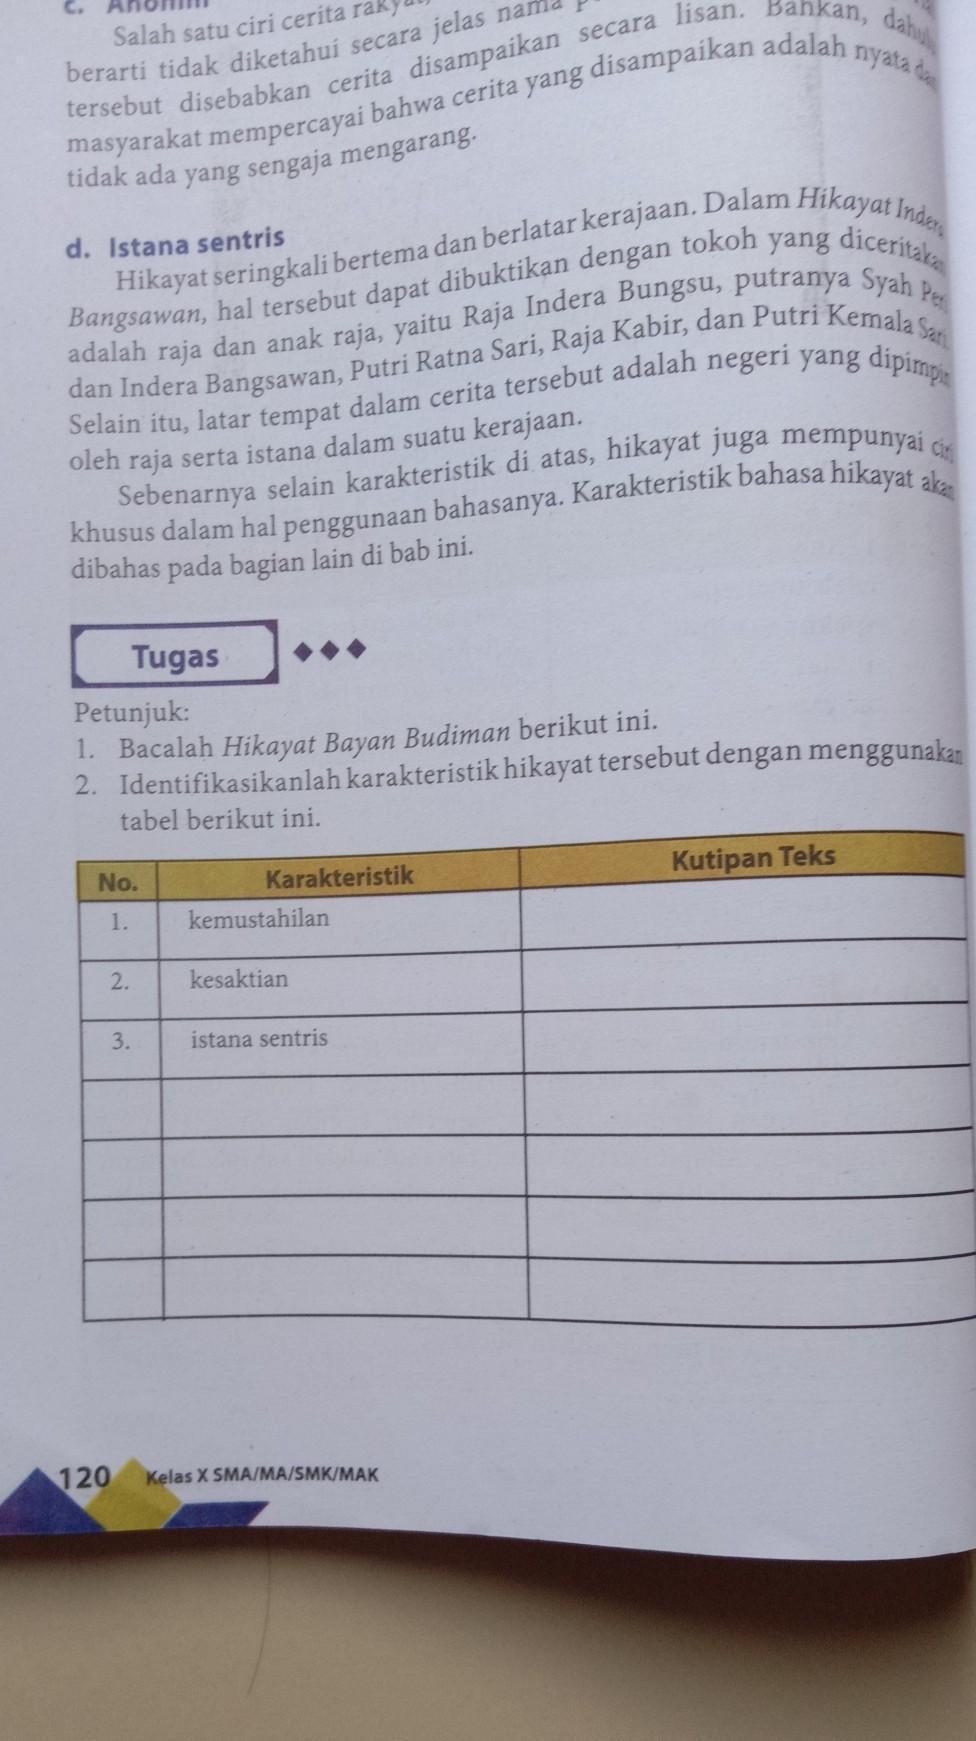 Bahasa Indonesia Kelas 10 Tugas Halaman 120 Brainly Co Id